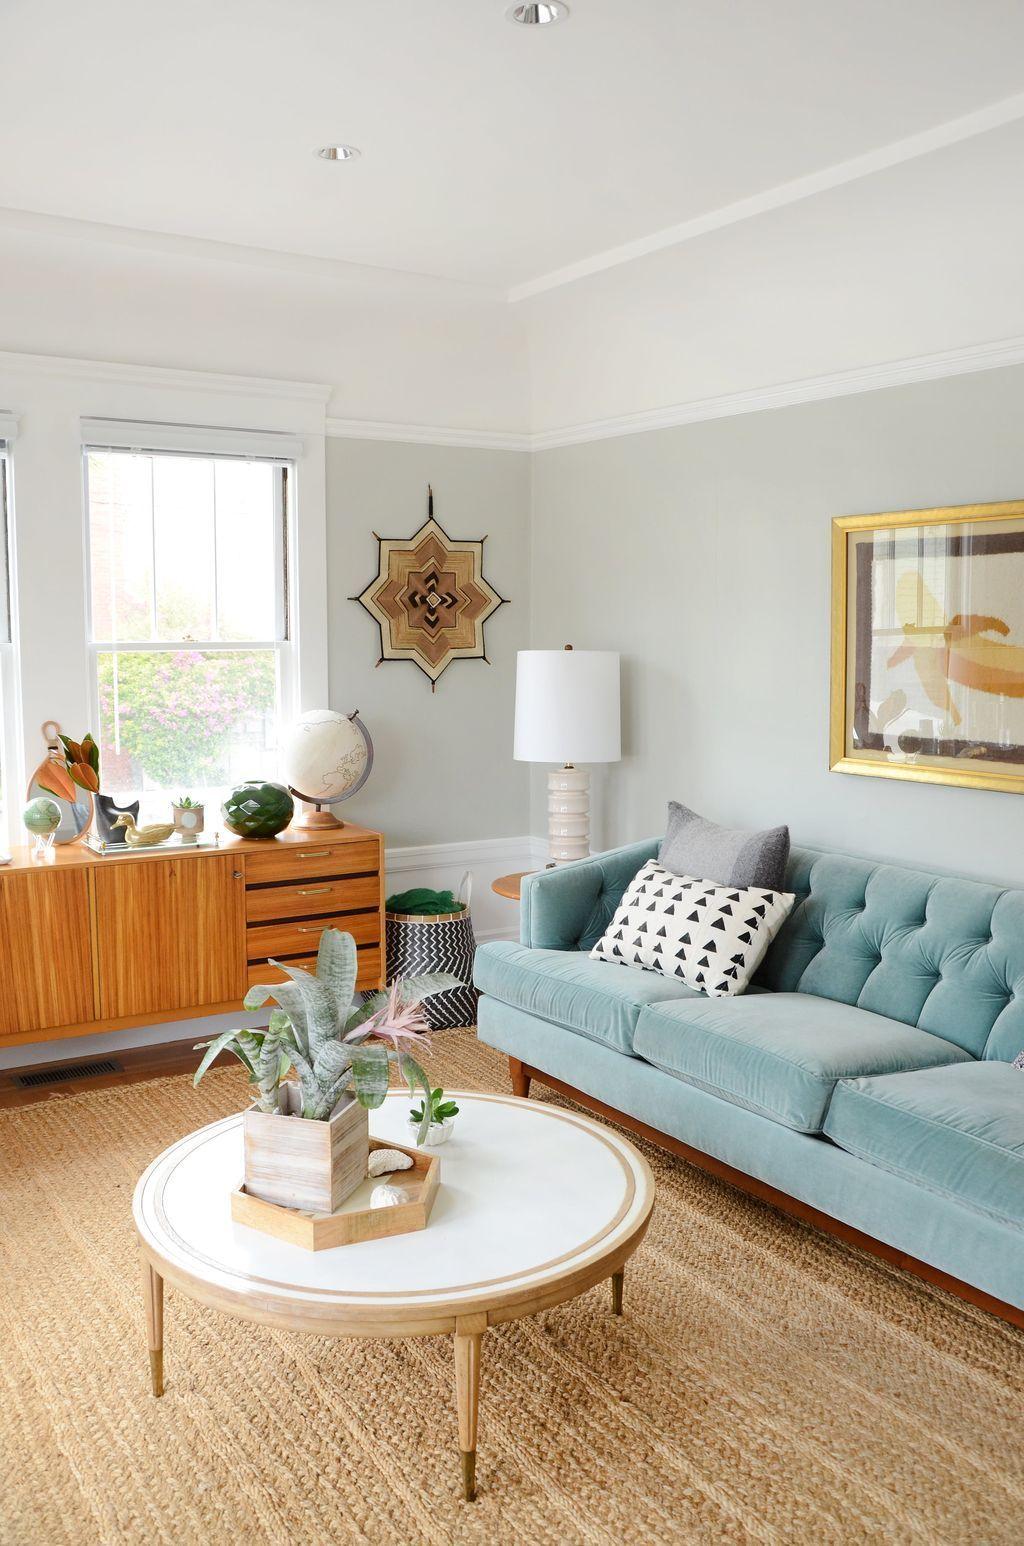 74 Mid Century Modern Apartment Decoration Ideas | Pinterest | Mein ...